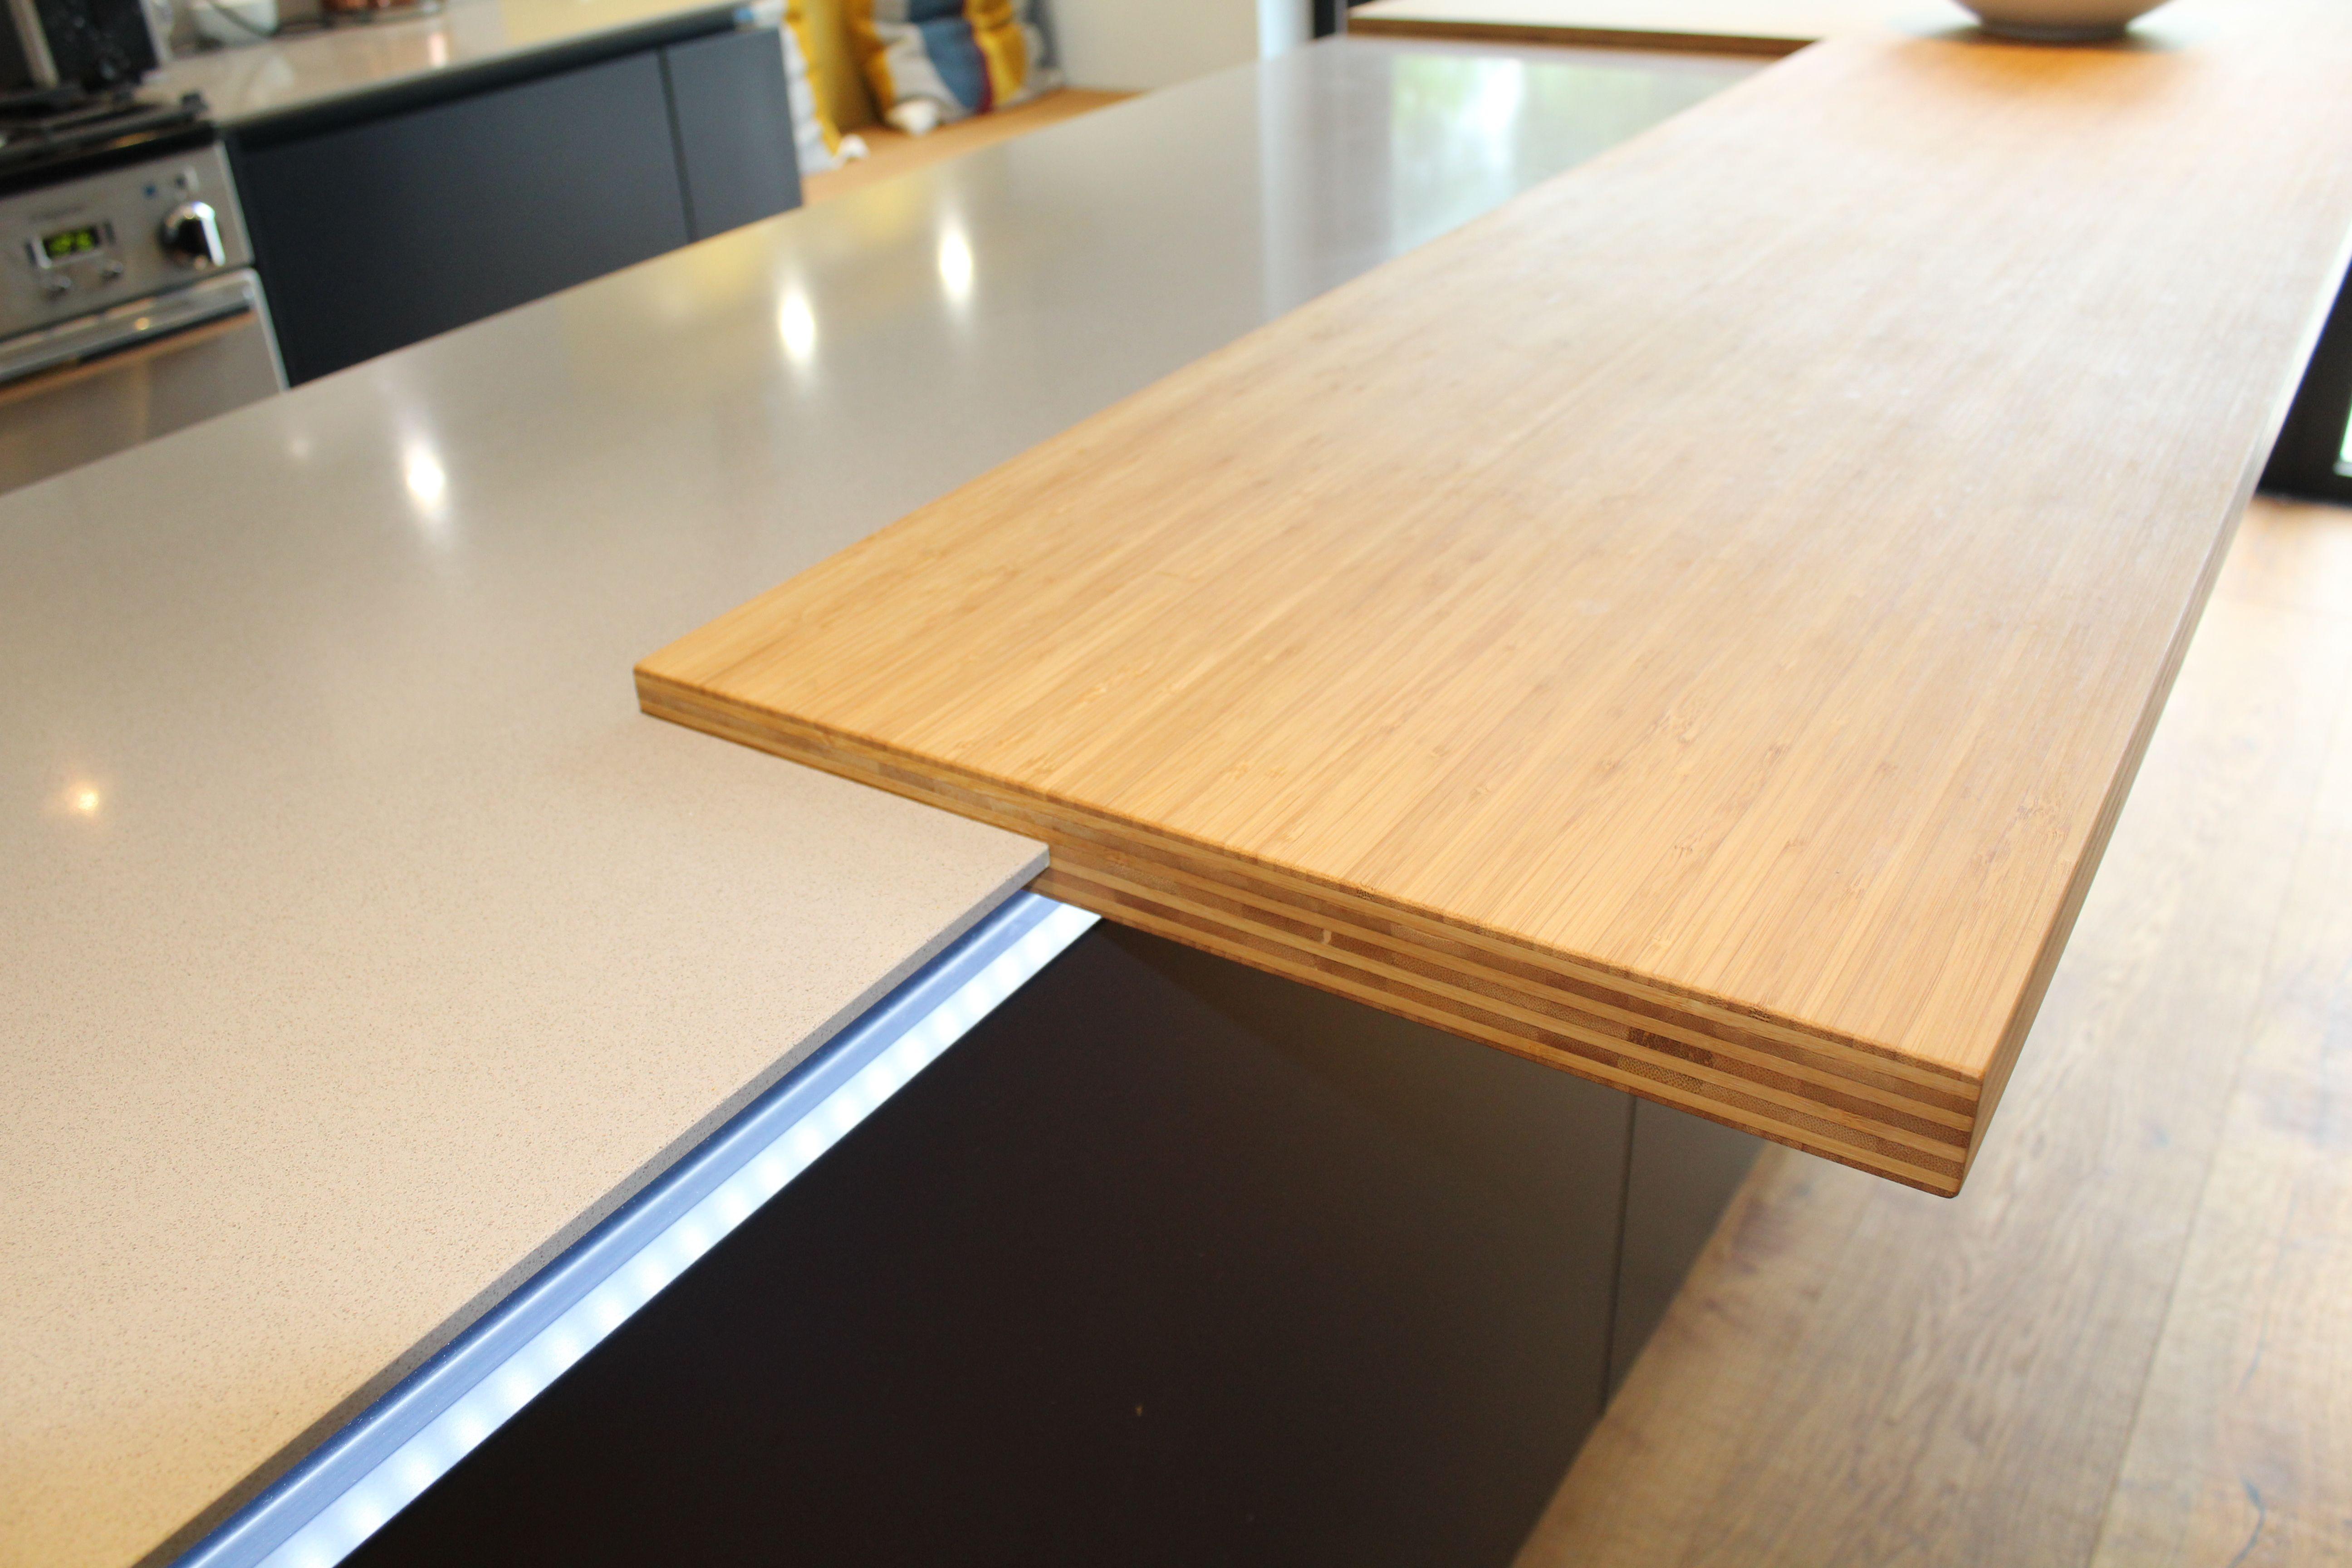 Spekva Bamboo Bar Top On Alnostar Sund Kitchen By Phil Harflett Of